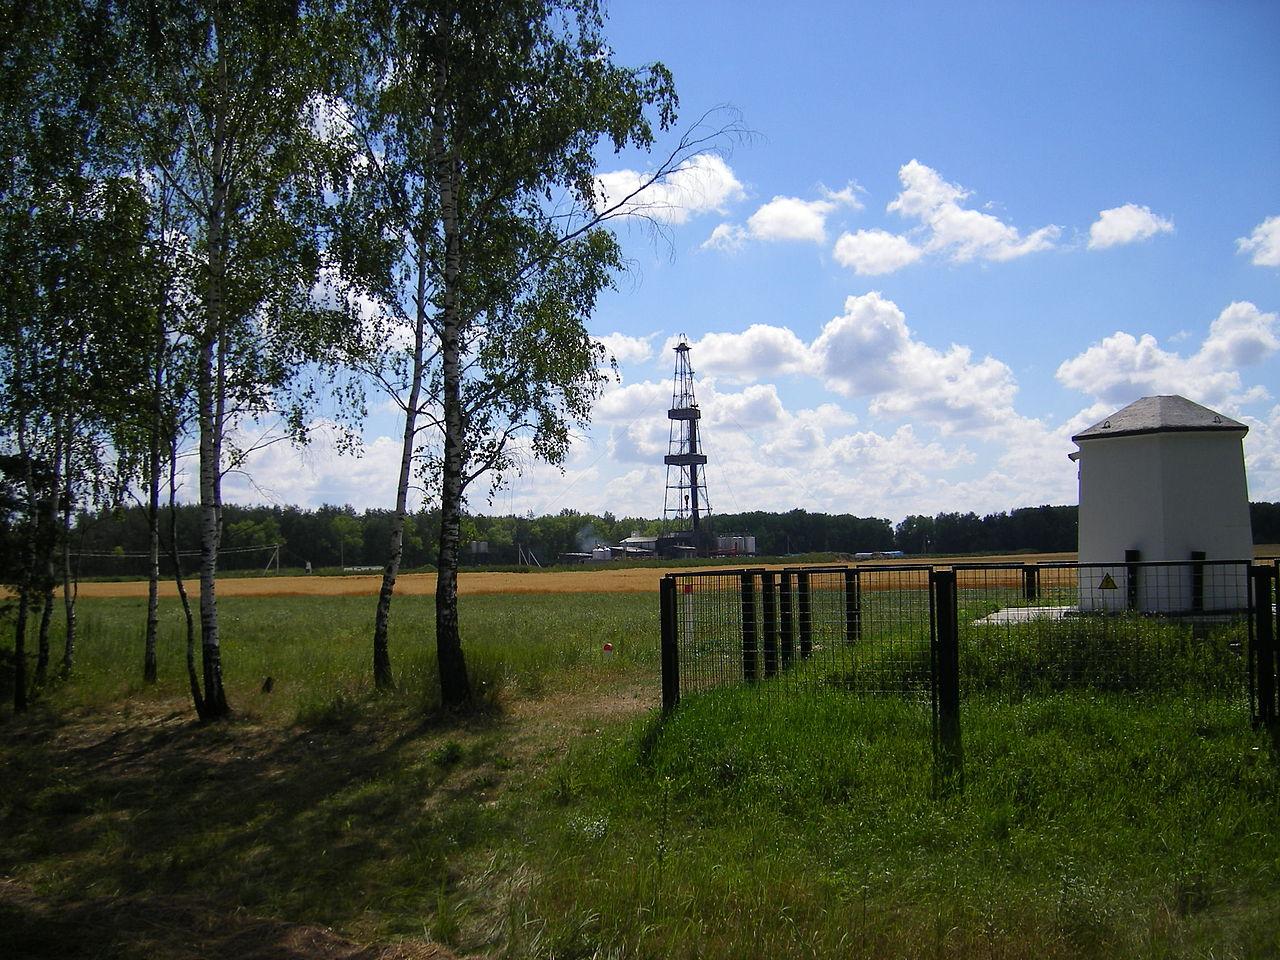 Нефтяная вышка в Речице, Белоруссия